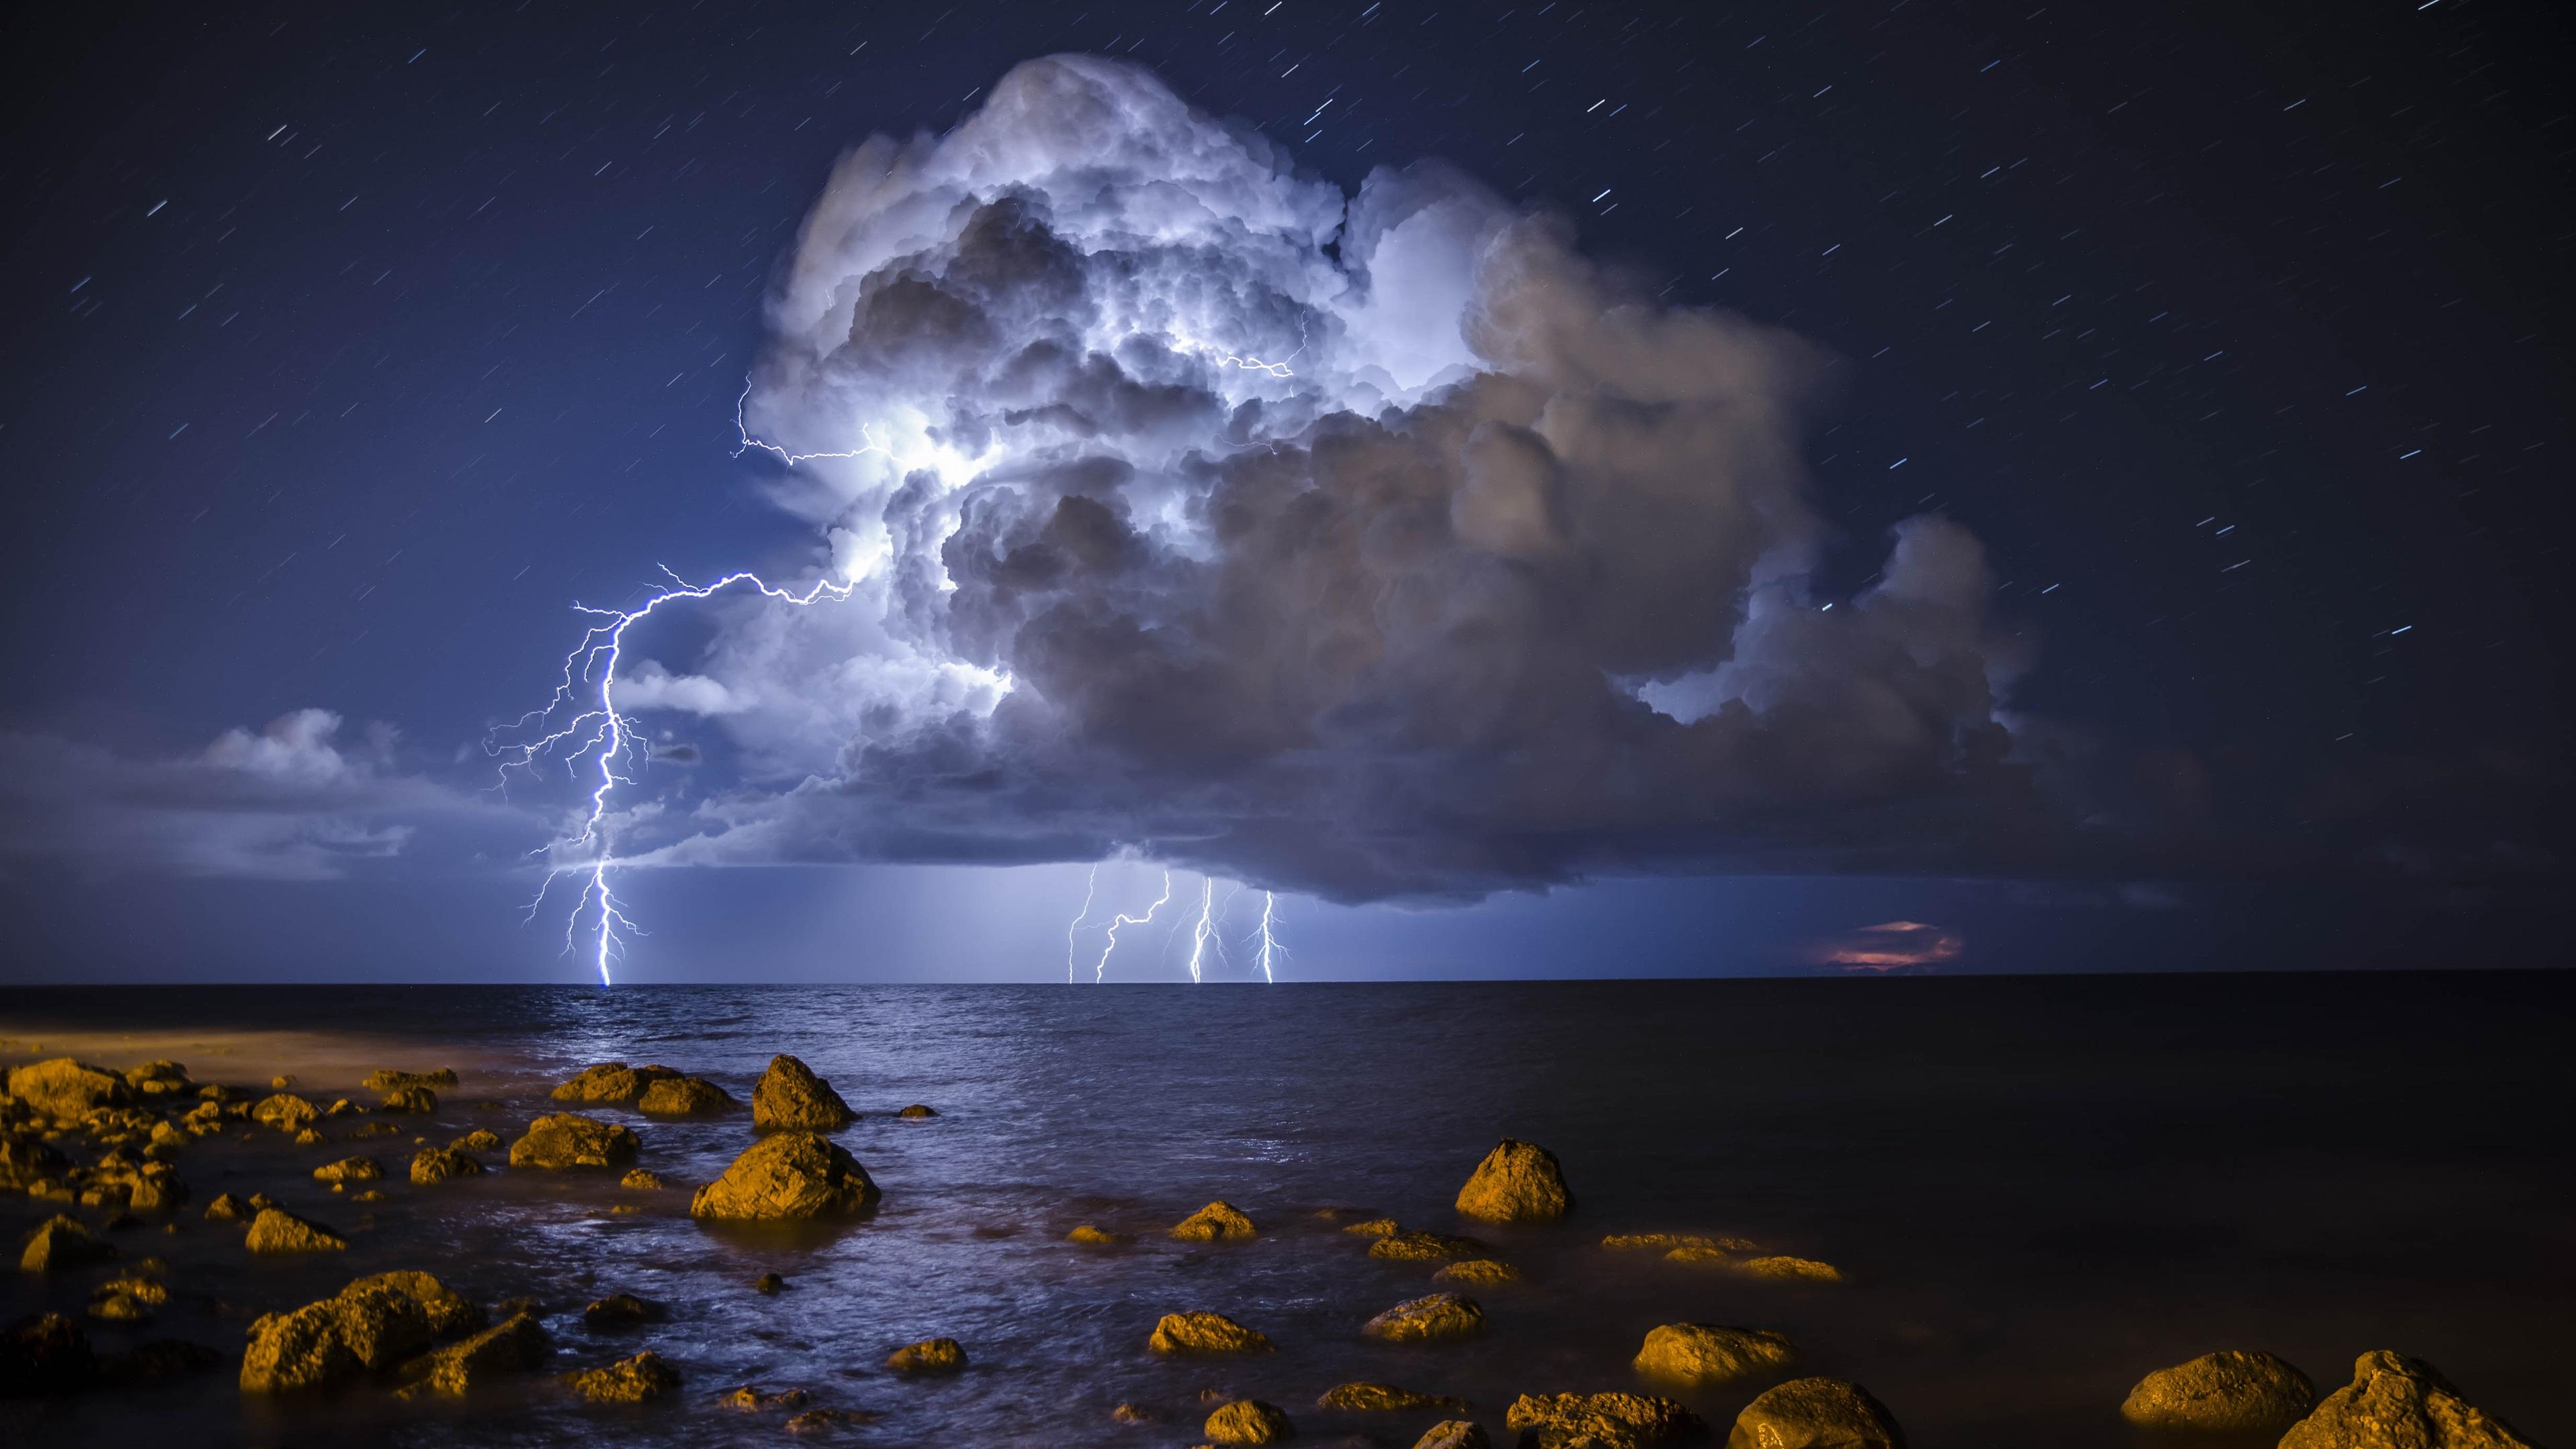 Wallpaper storm lightning sea stones 3840x2160 uhd 4k for Immagini divertenti desktop